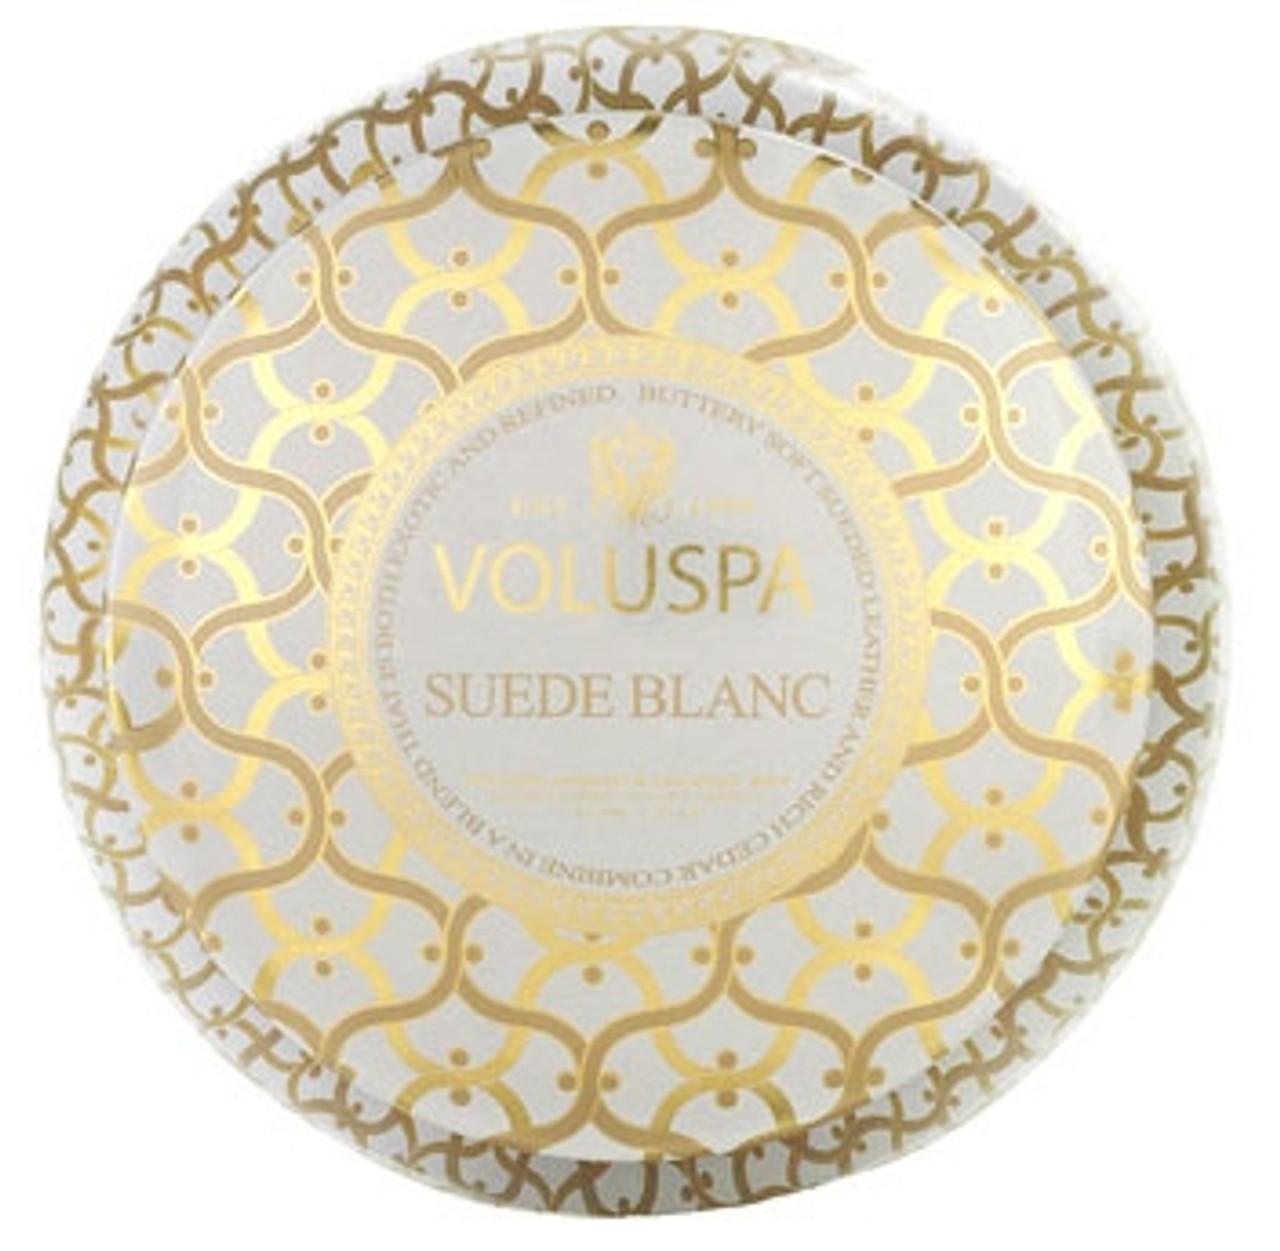 Voluspa Metallo - Suede Blanc